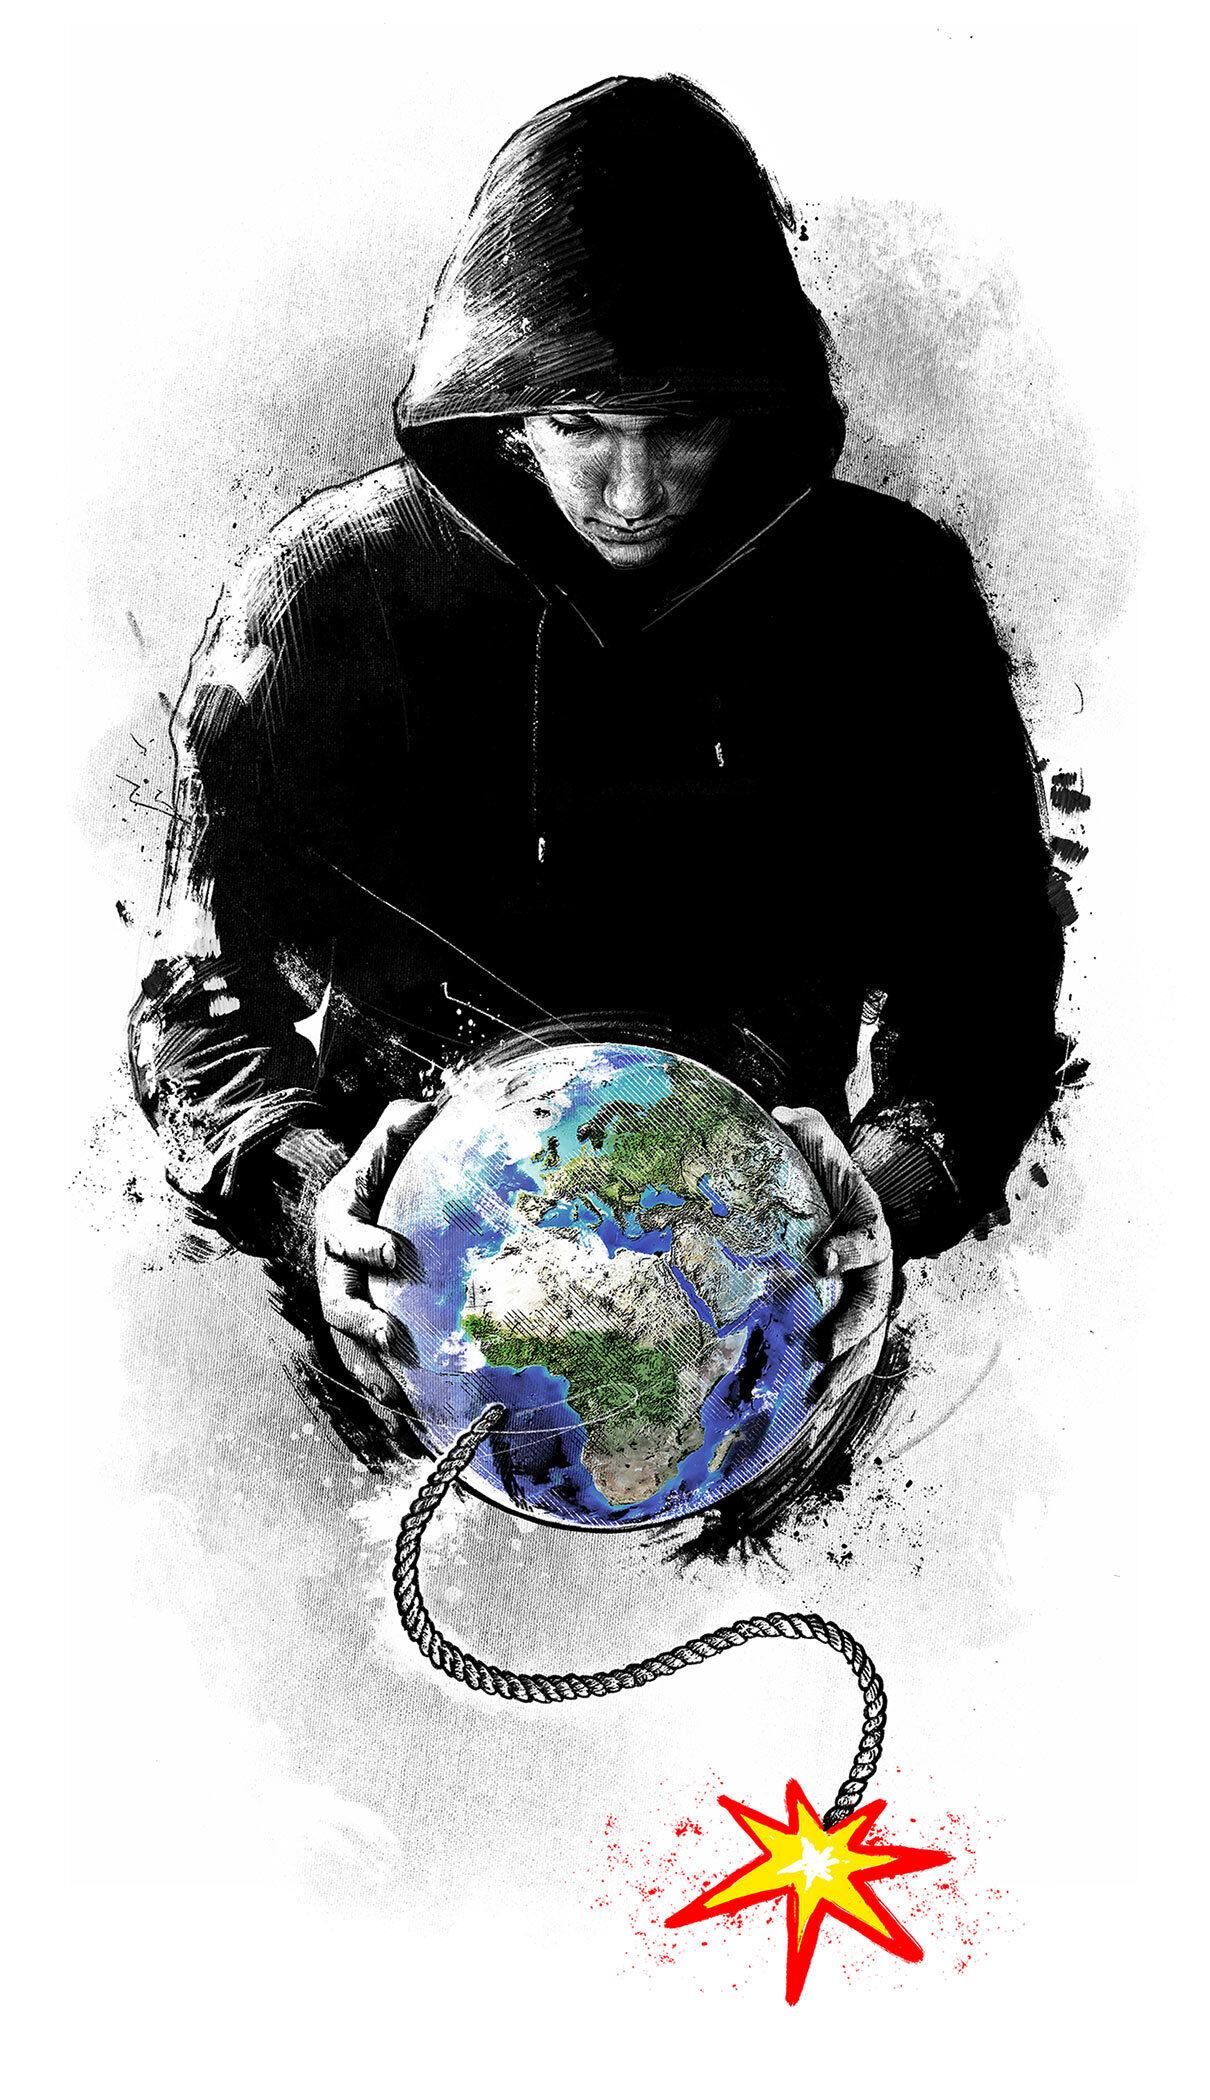 Editorial earth klima terror klimaerwaermung fridays for future world illustration global warming hands time bomb zeitbombe - Kornel Illustration | Kornel Stadler portfolio